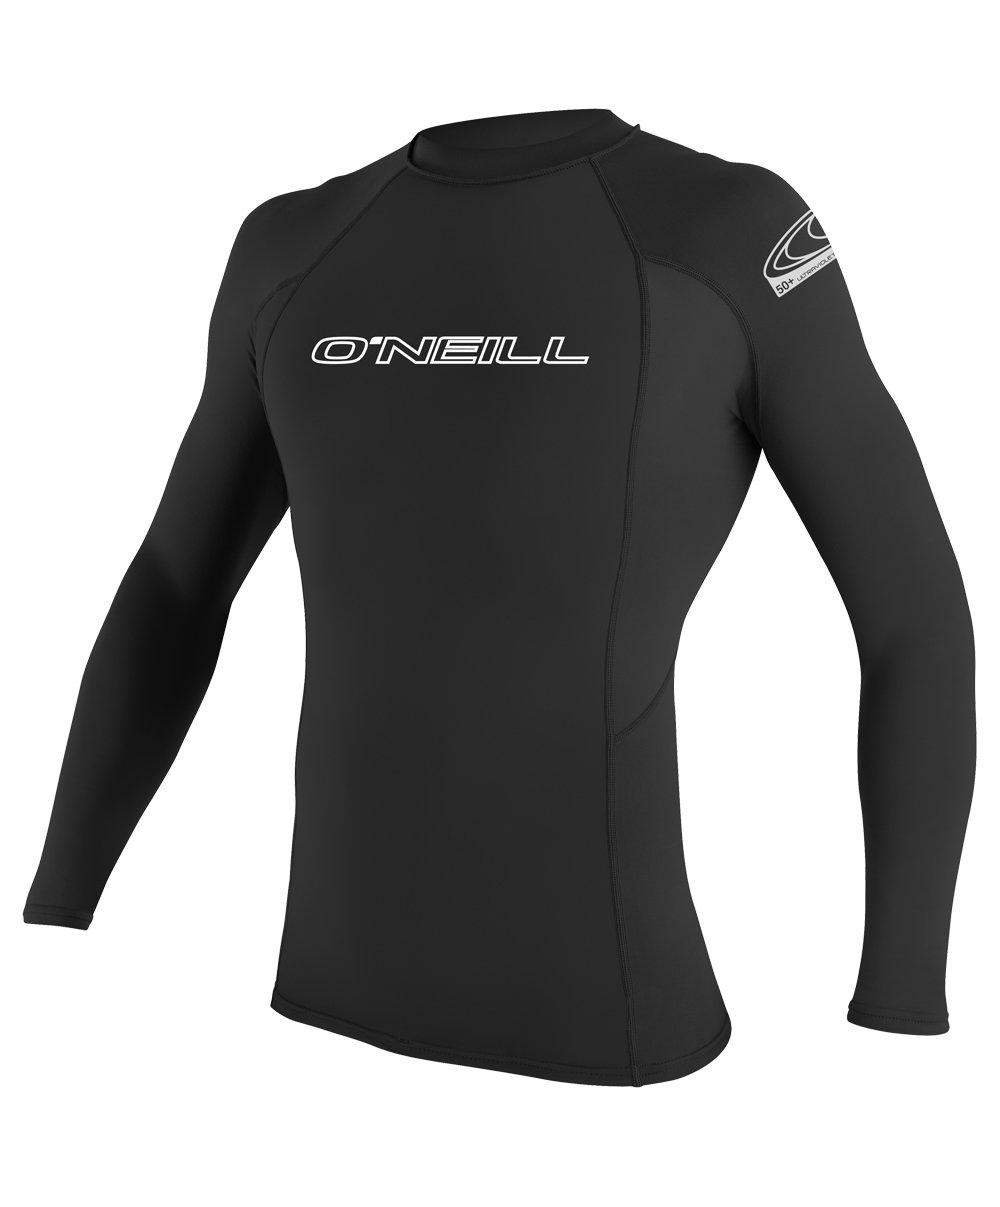 O'Neill Men's Basic Skins UPF 50+ Long Sleeve Rash Guard, Black, Medium